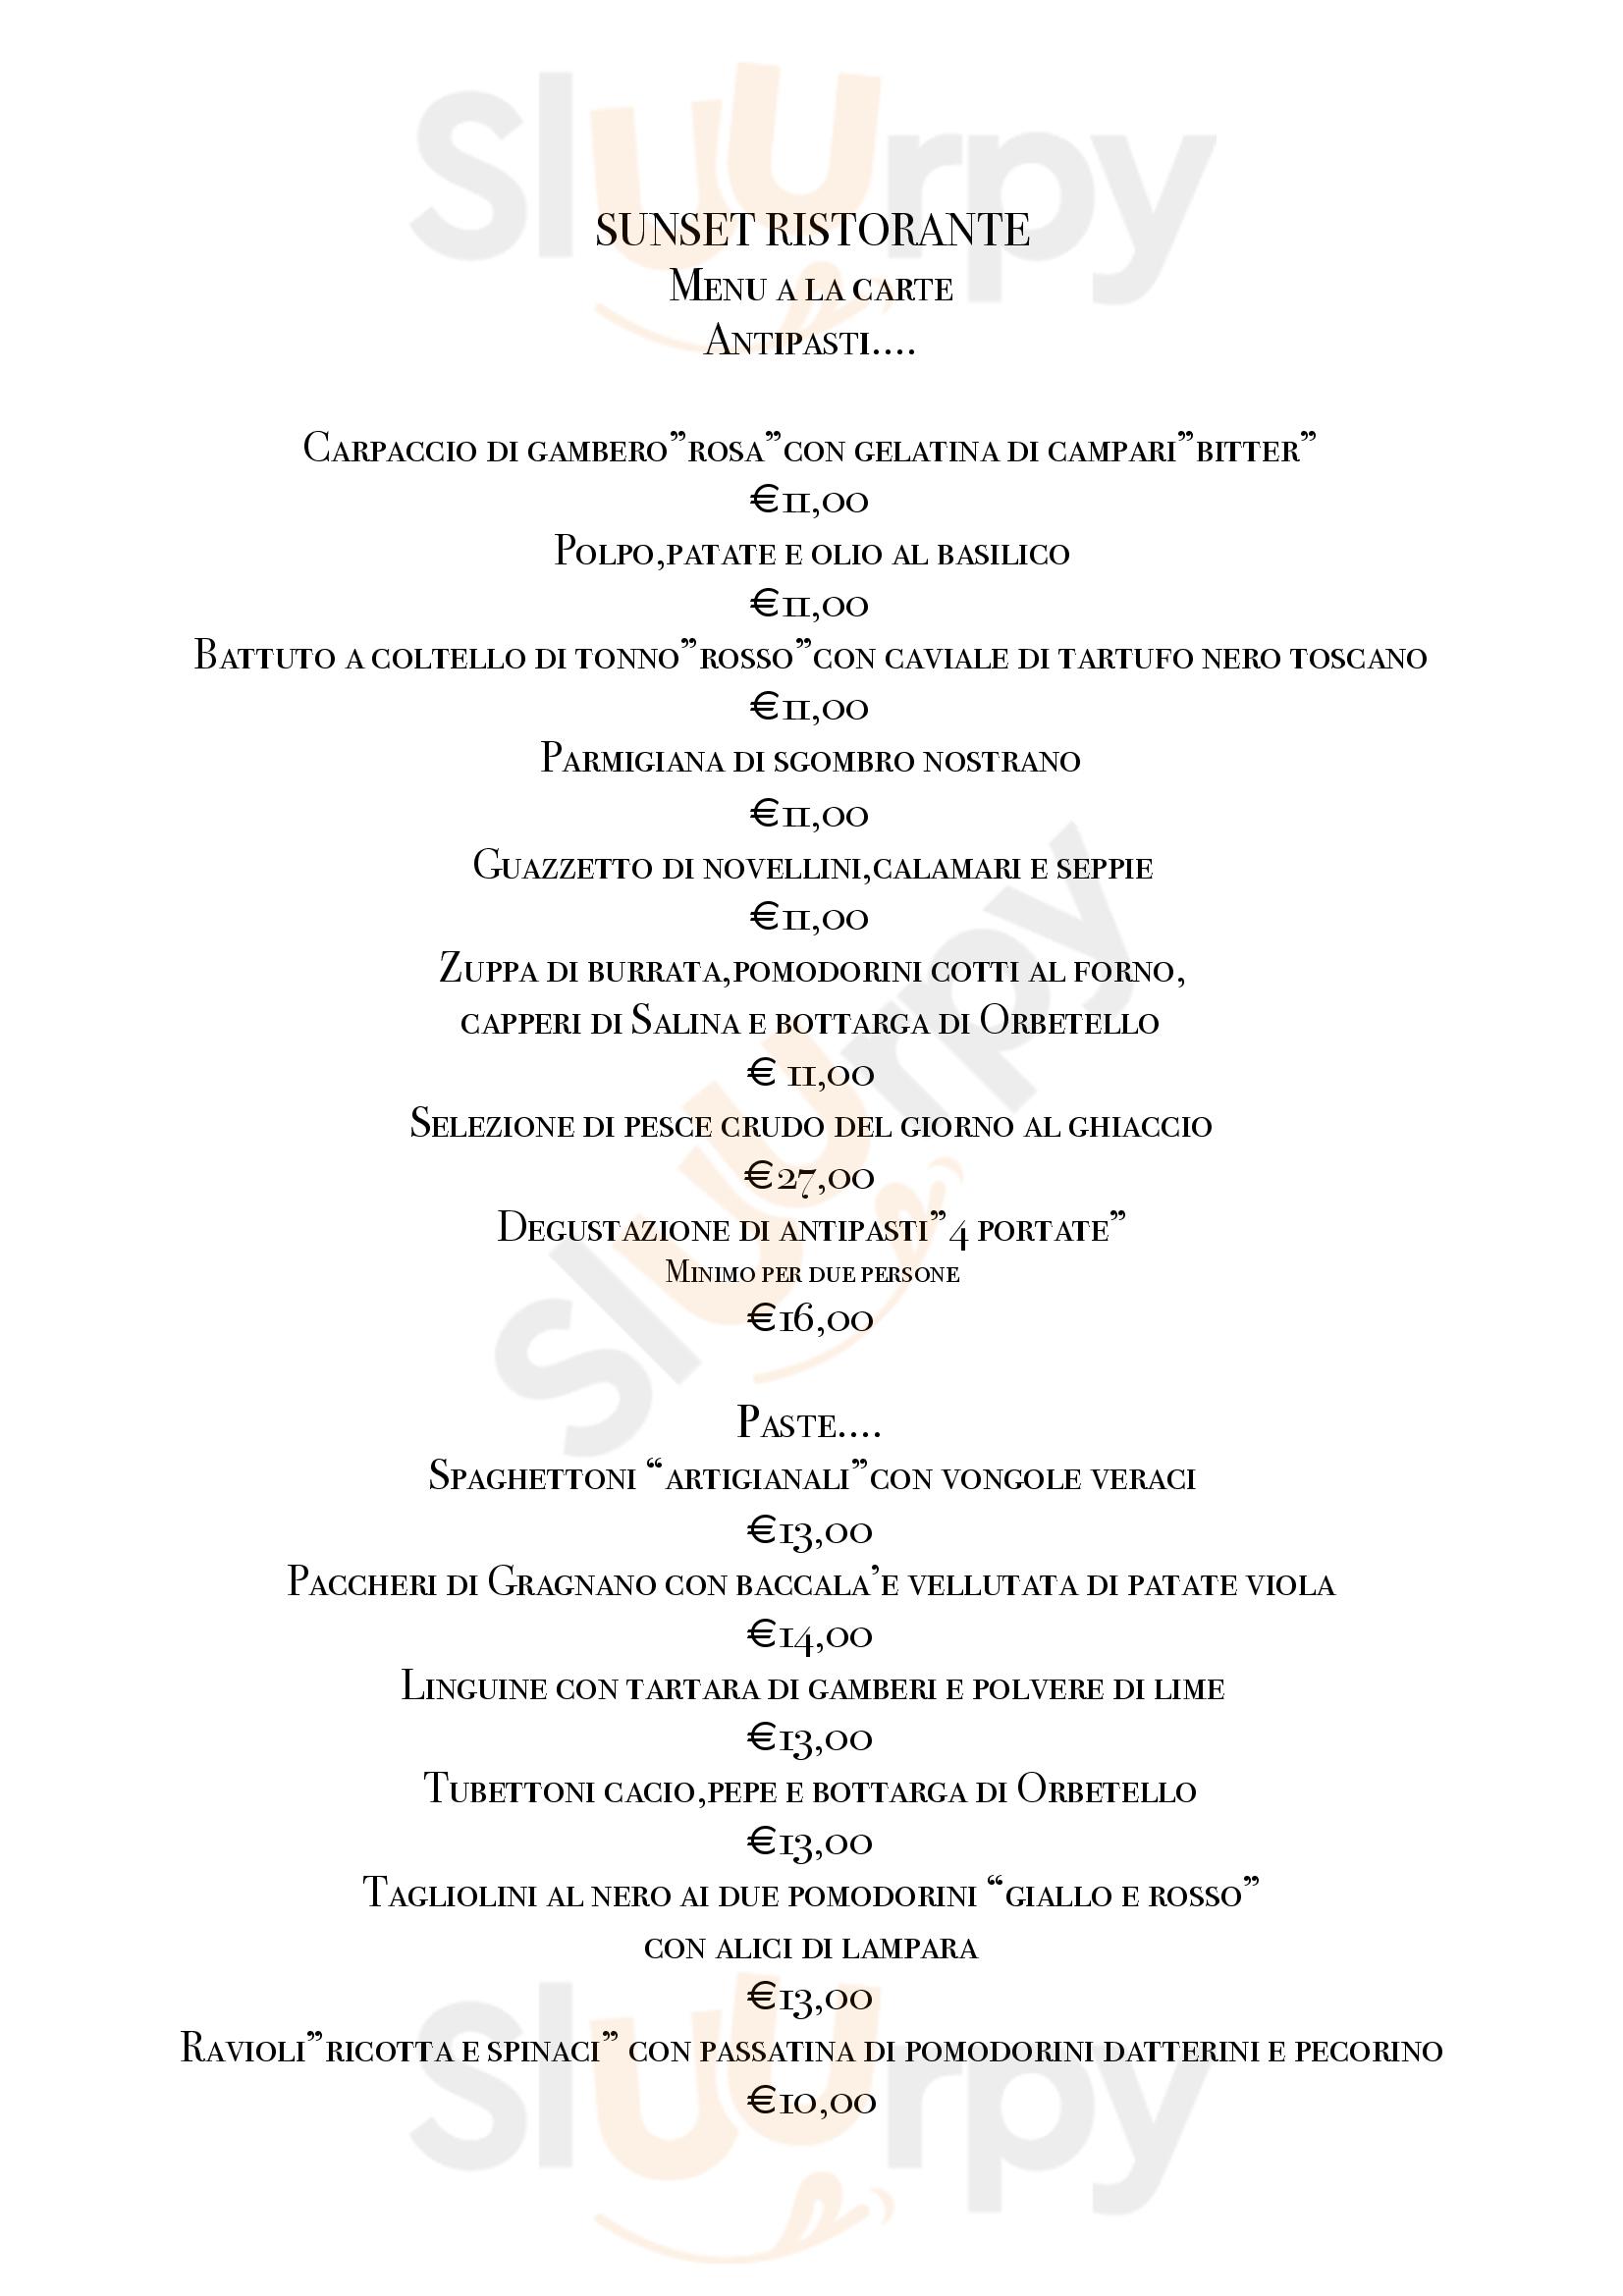 Sunset Restaurant Orbetello menù 1 pagina